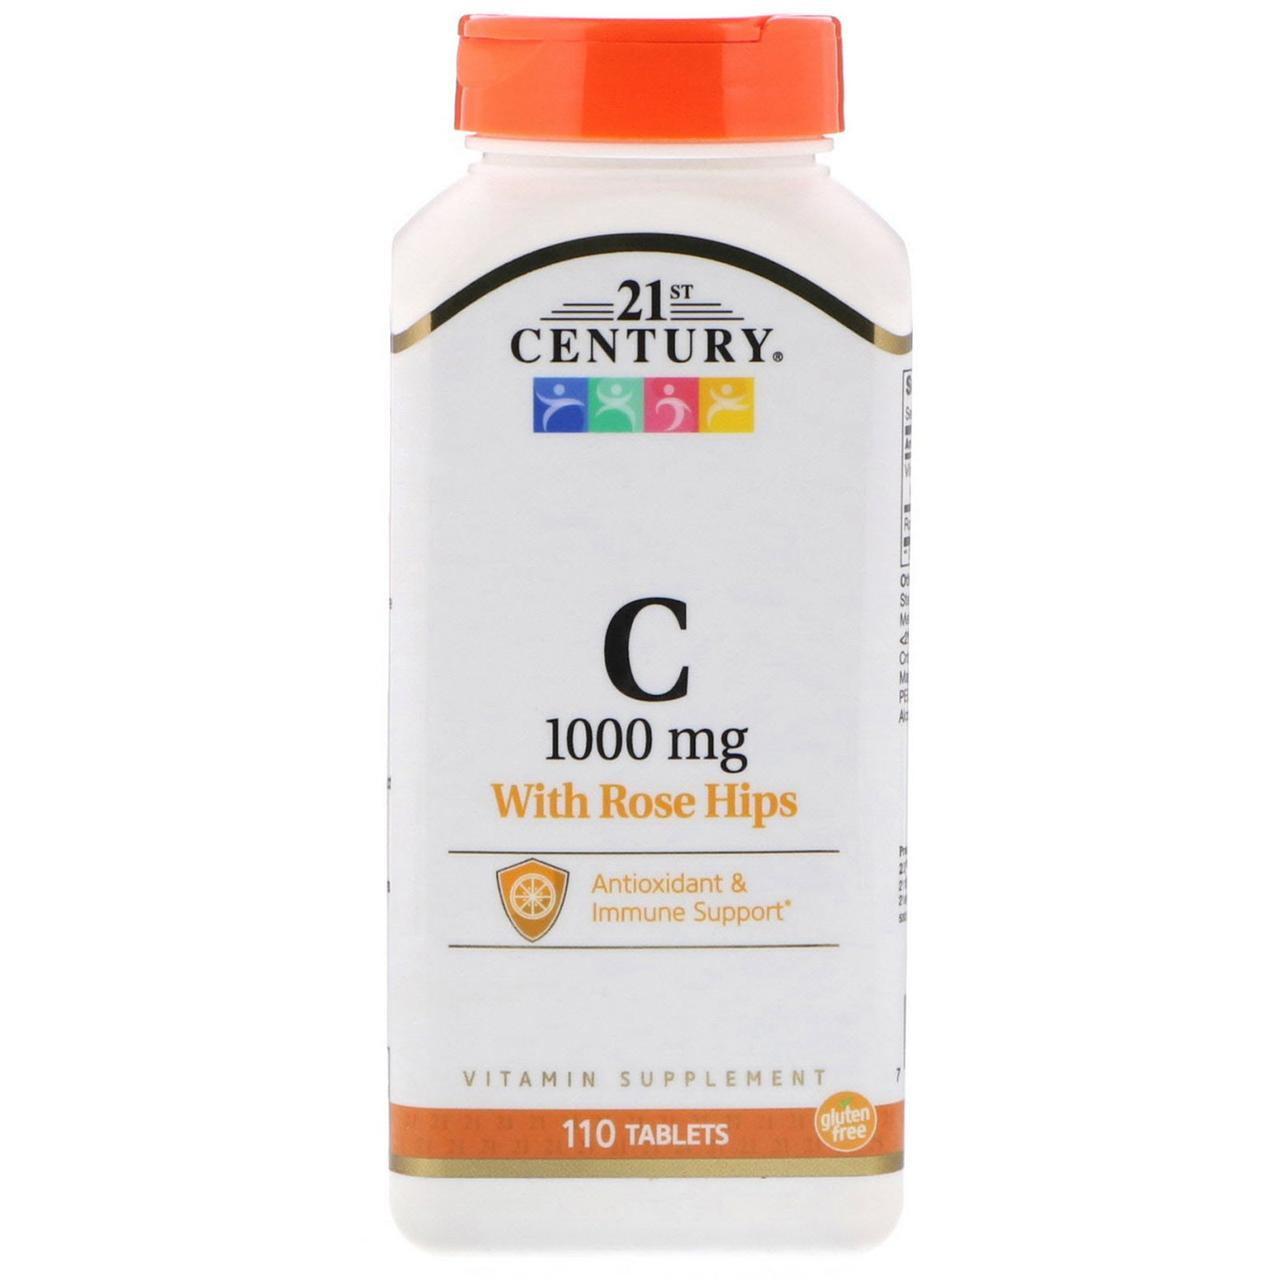 Витамин C с плодами шиповника, 1000 мг, 21st Century (США), 110 таблеток